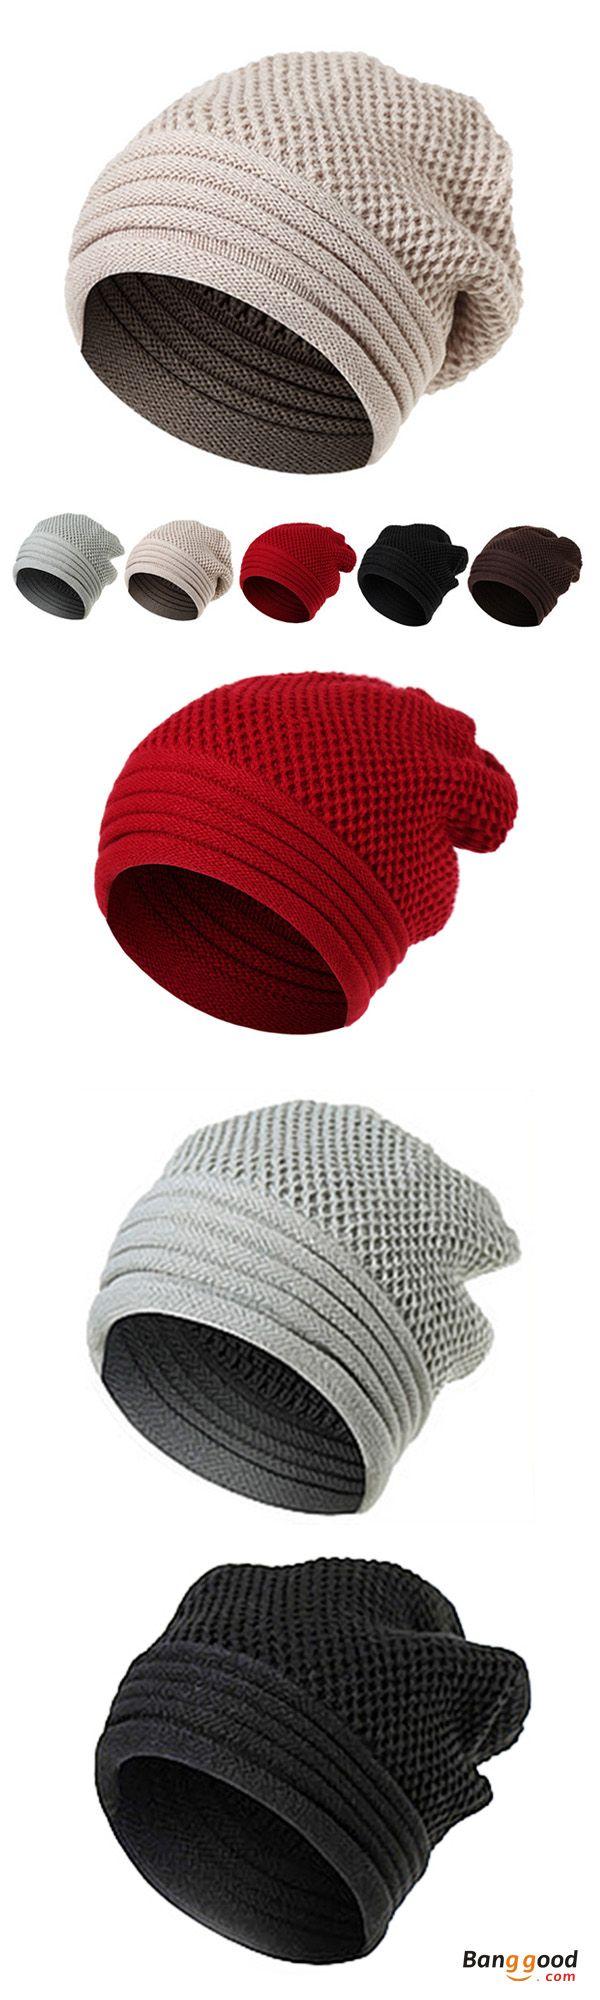 486f044d7b471 US 9.59+Free shipping. Men Hat